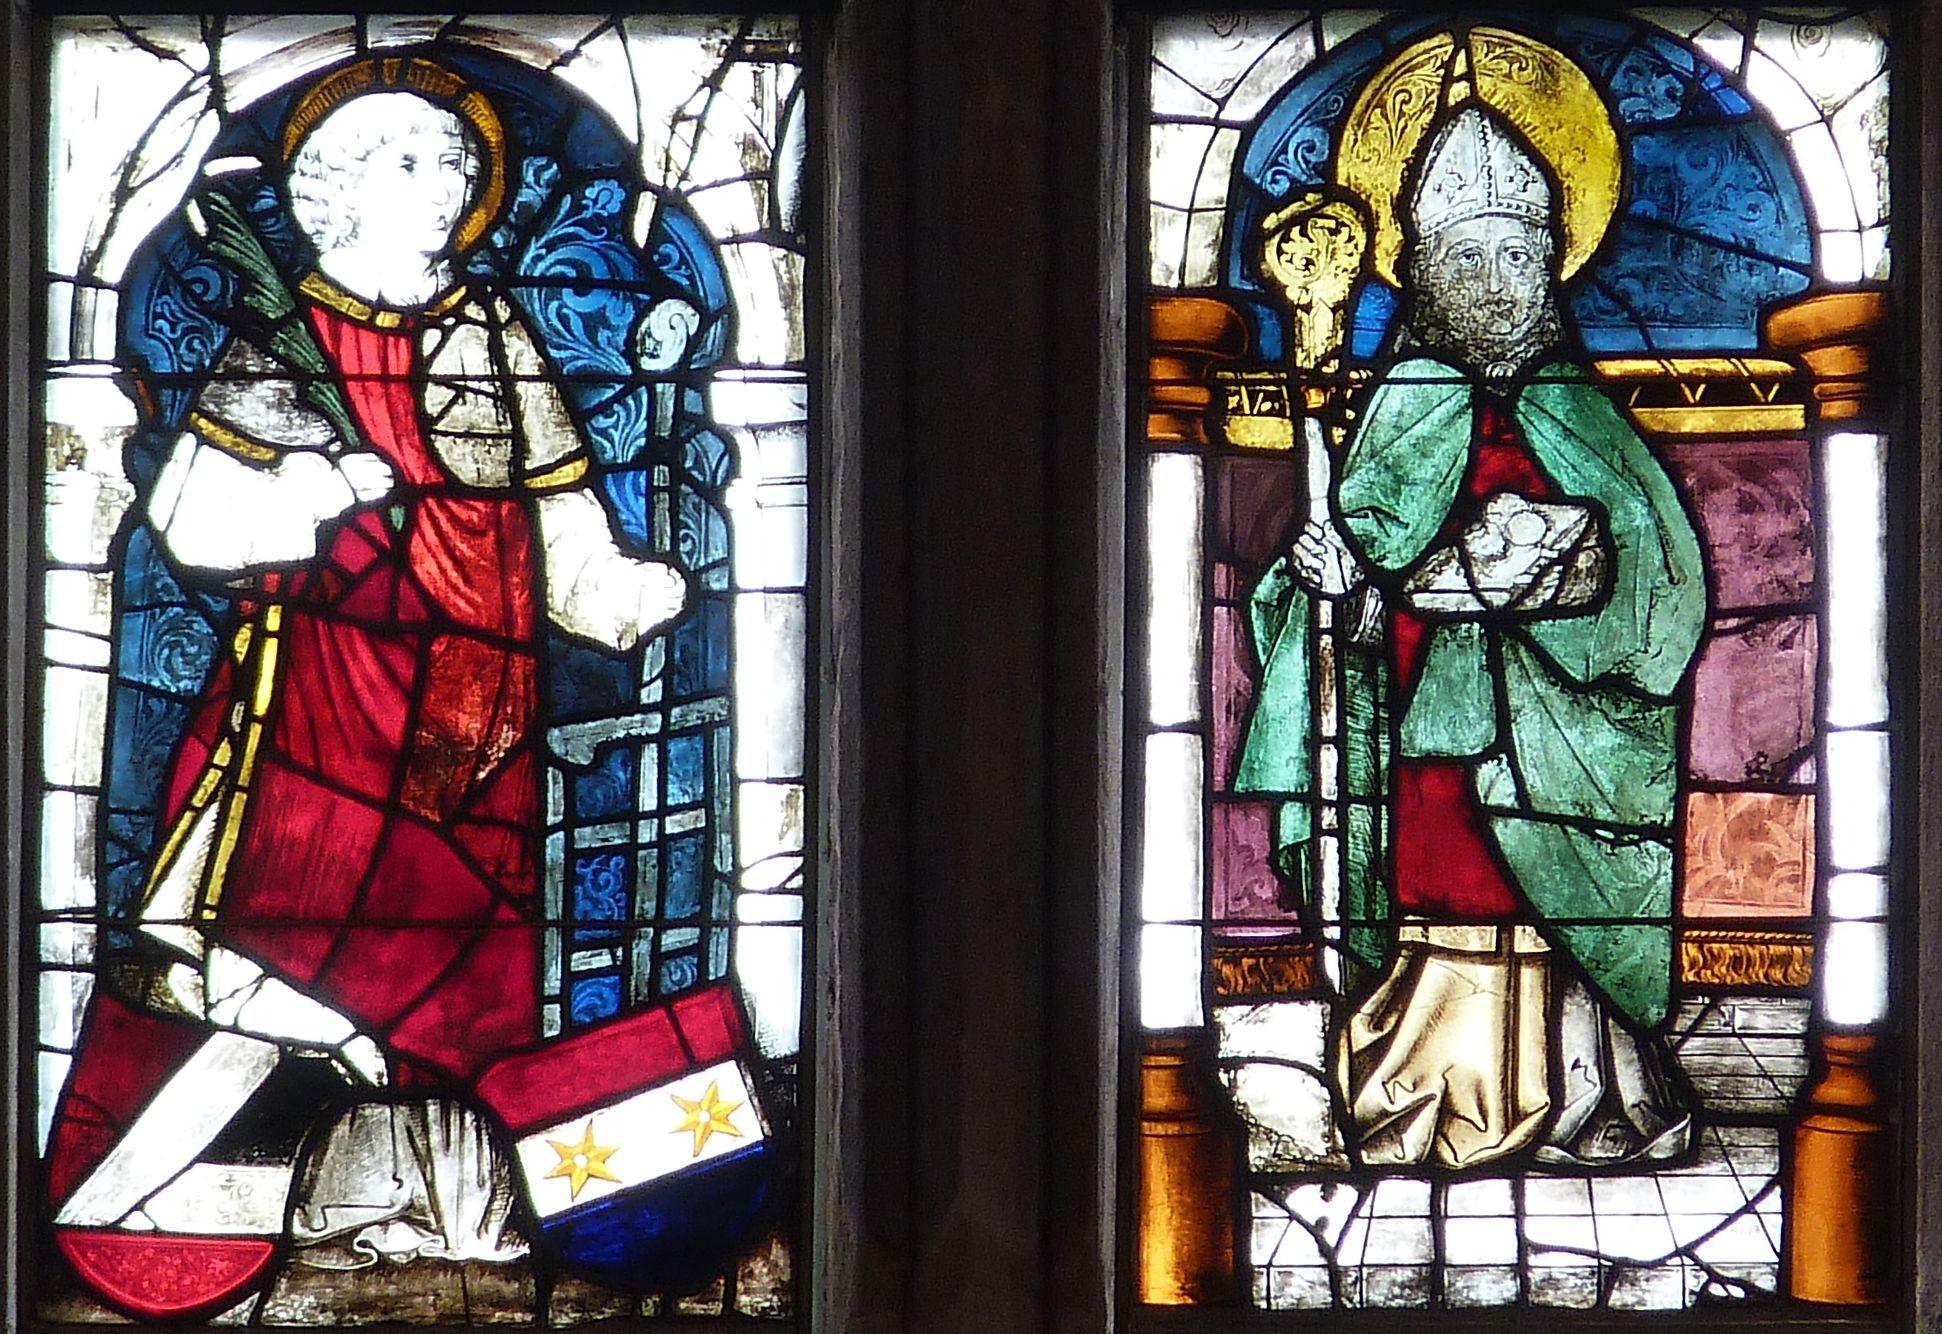 Ratsfenster unterstes Band: links St. Lorenz, rechts St. Stephanus